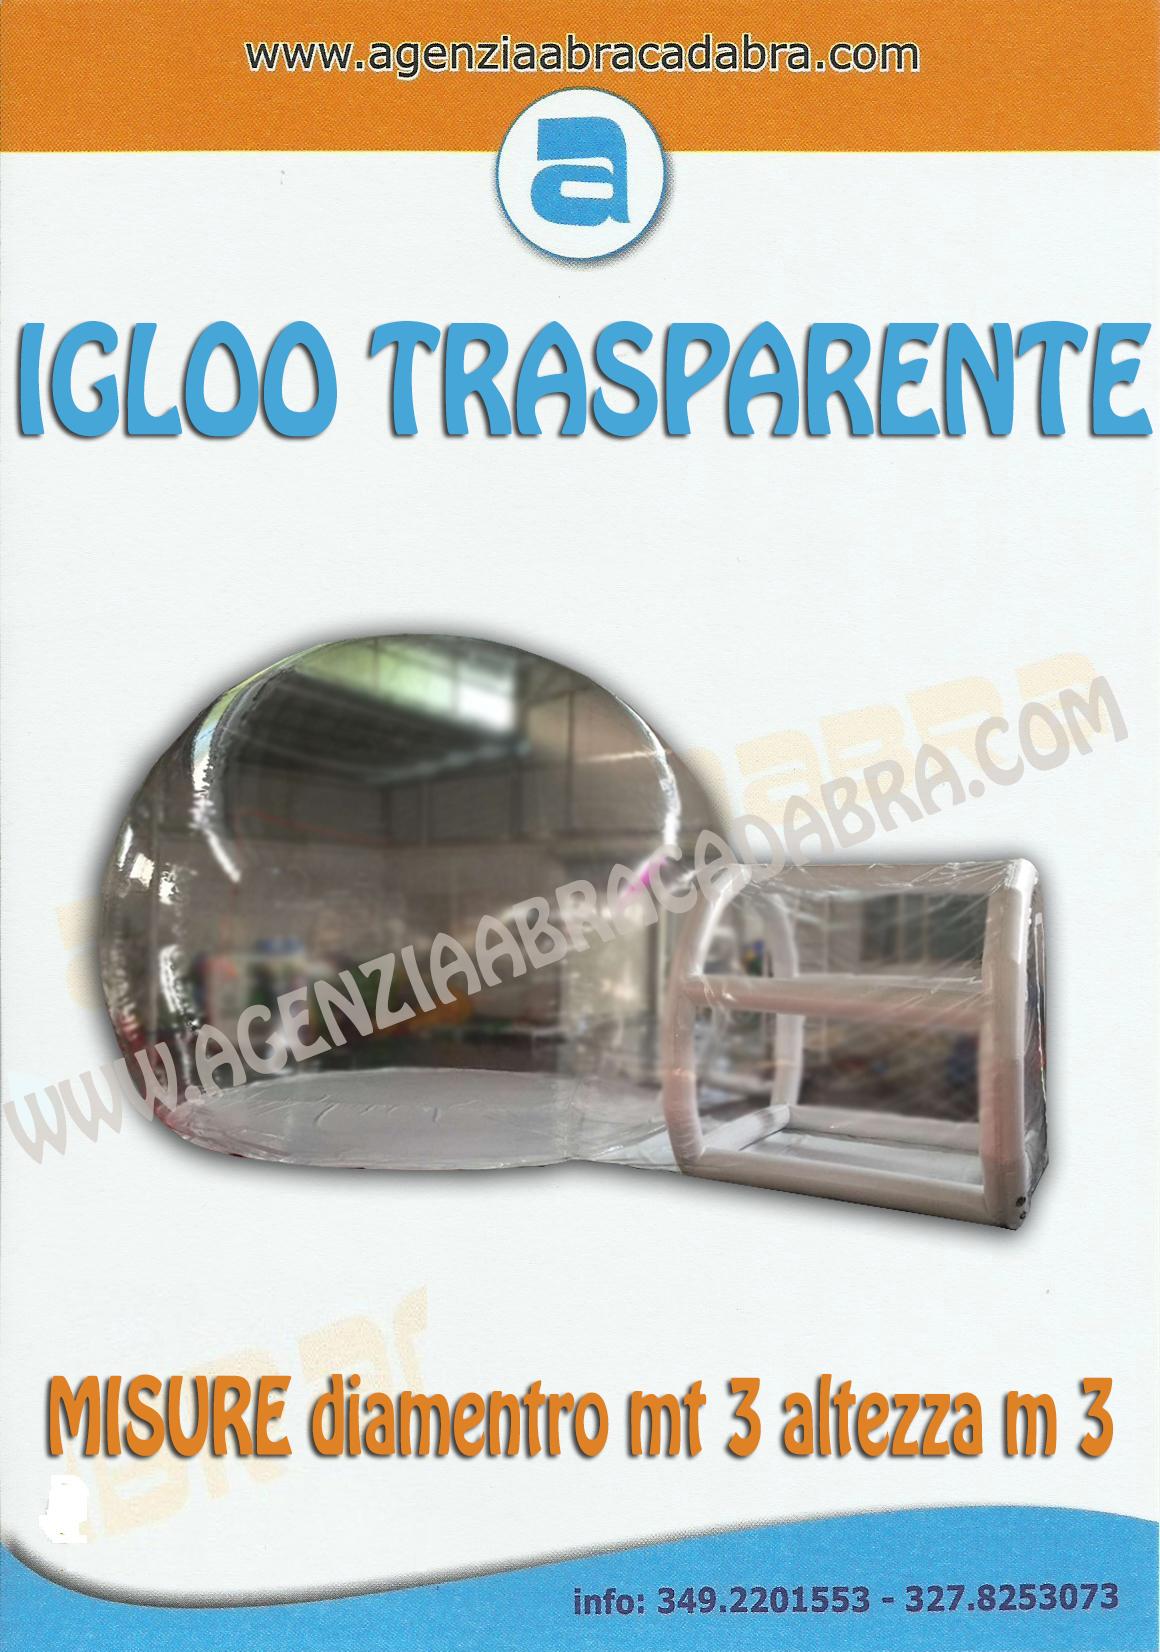 igloo-trasparente